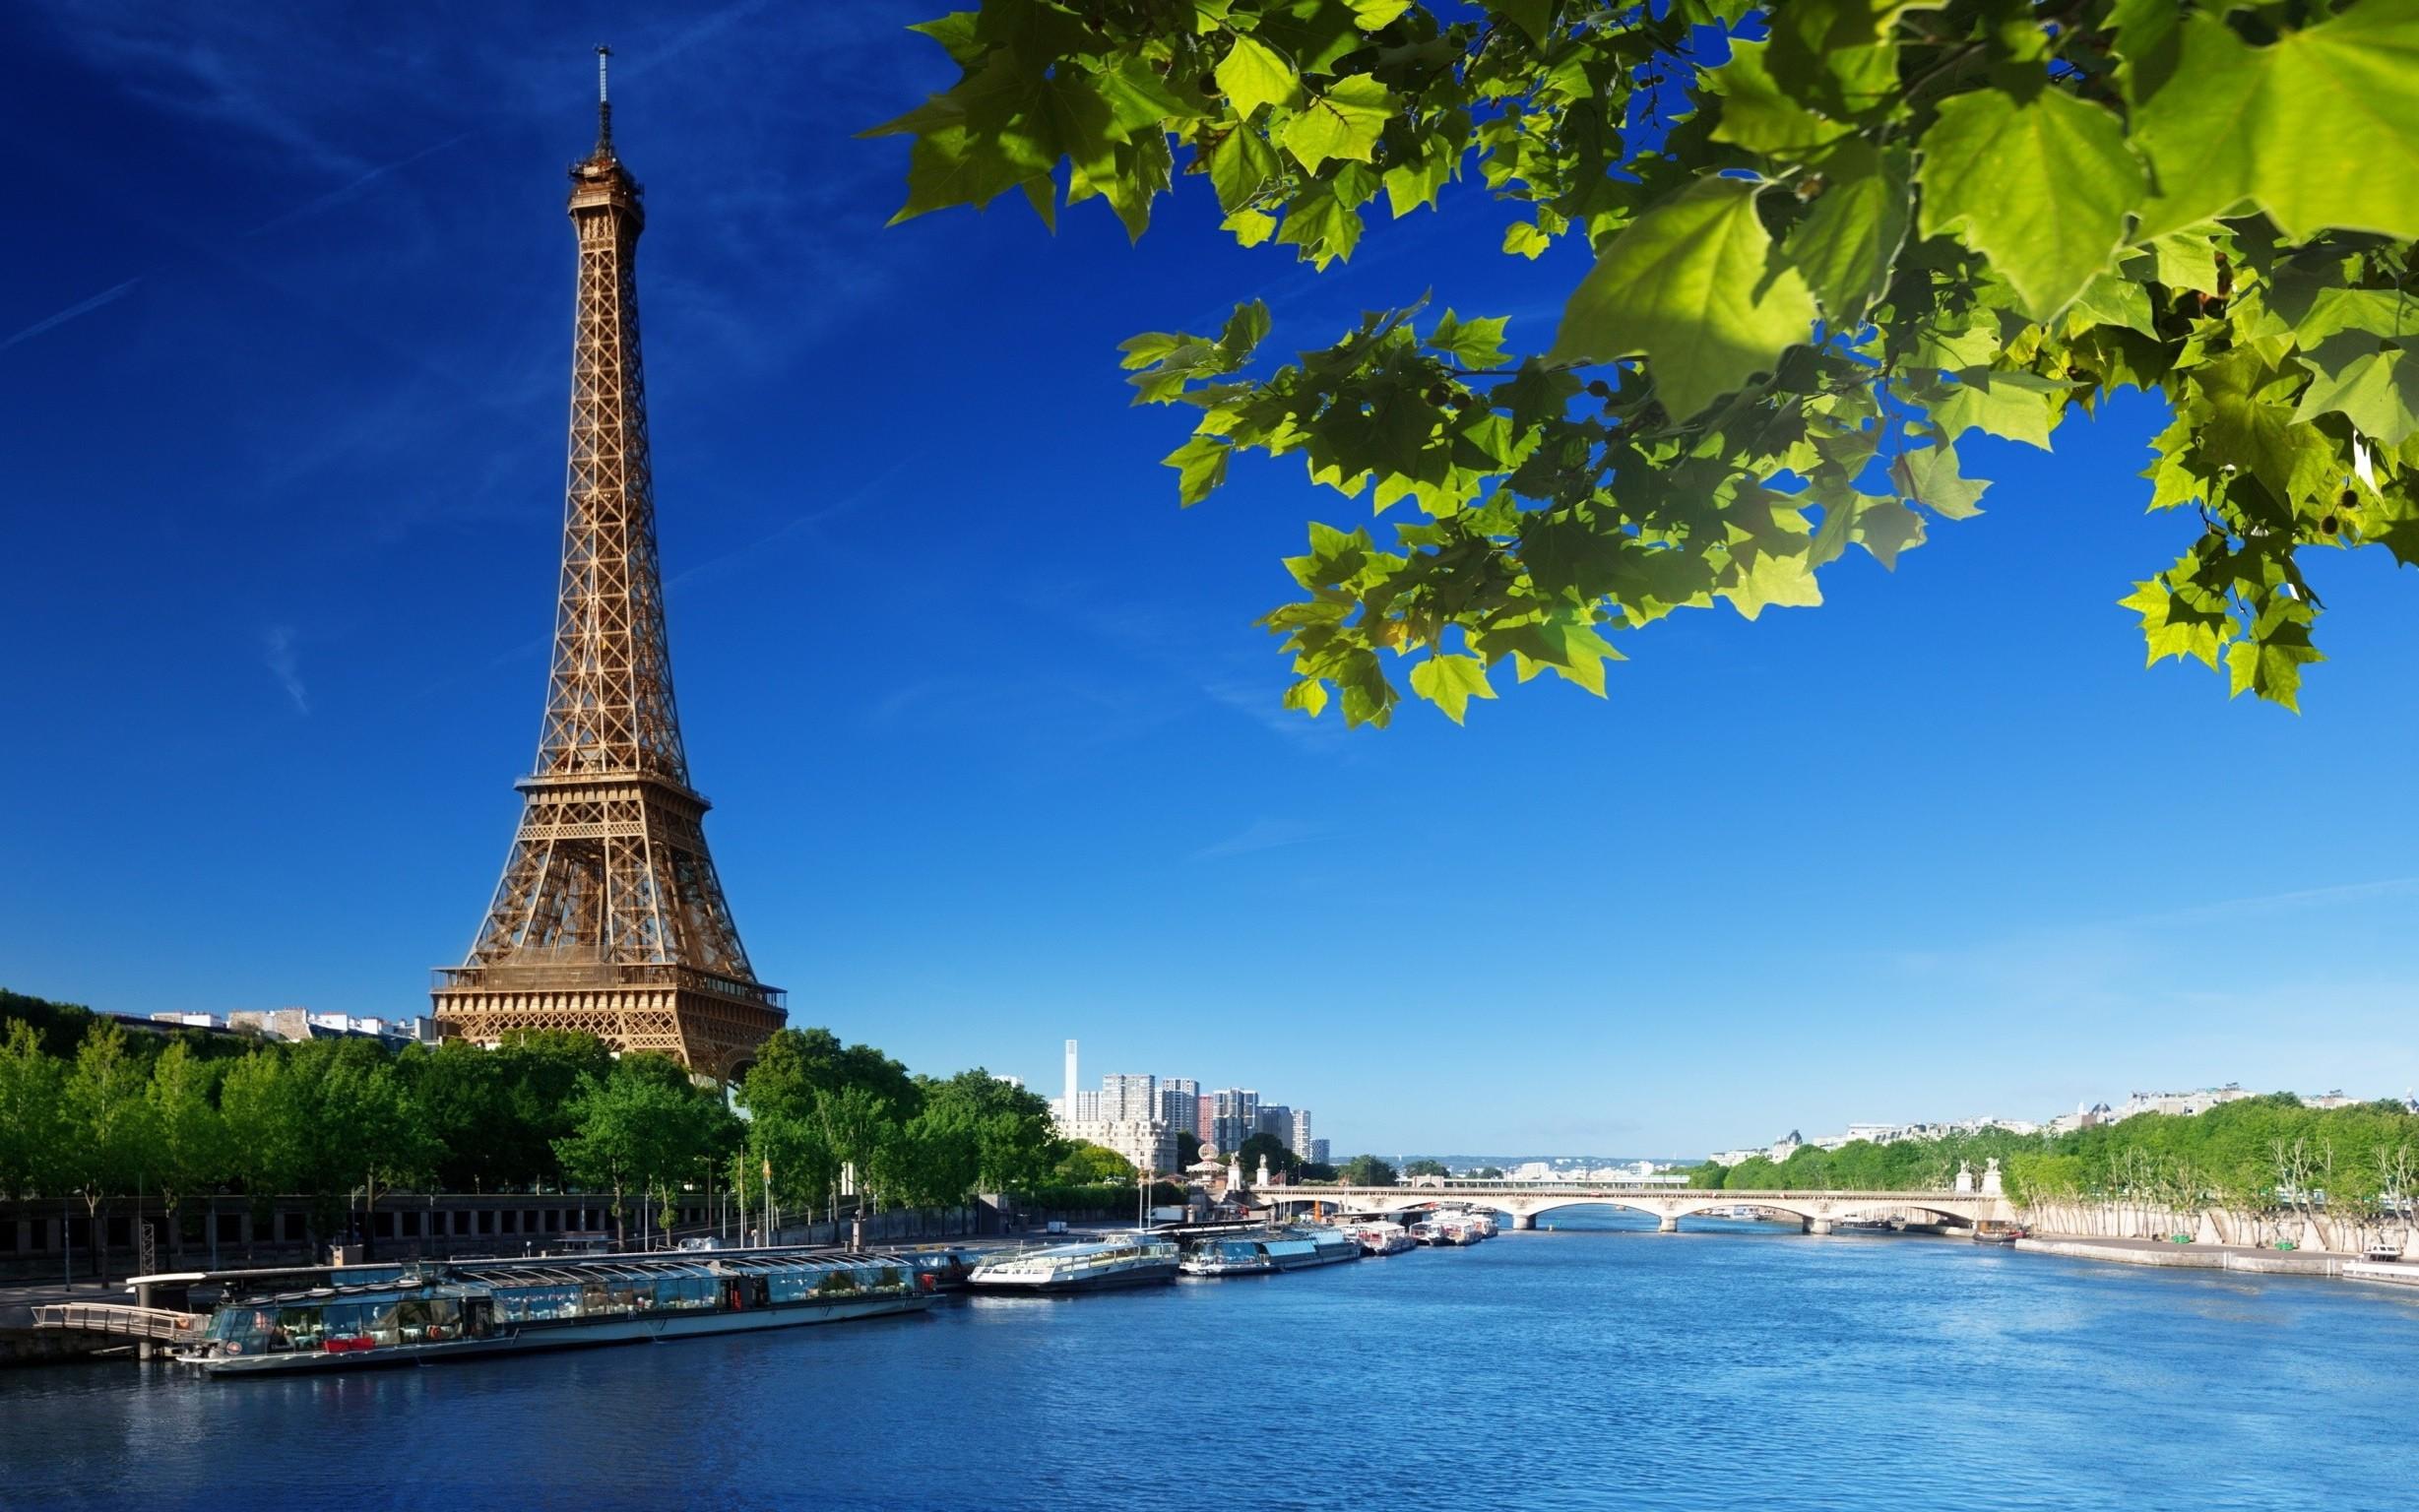 Wallpaper 2457x1536 Px Eiffel Tower Paris River